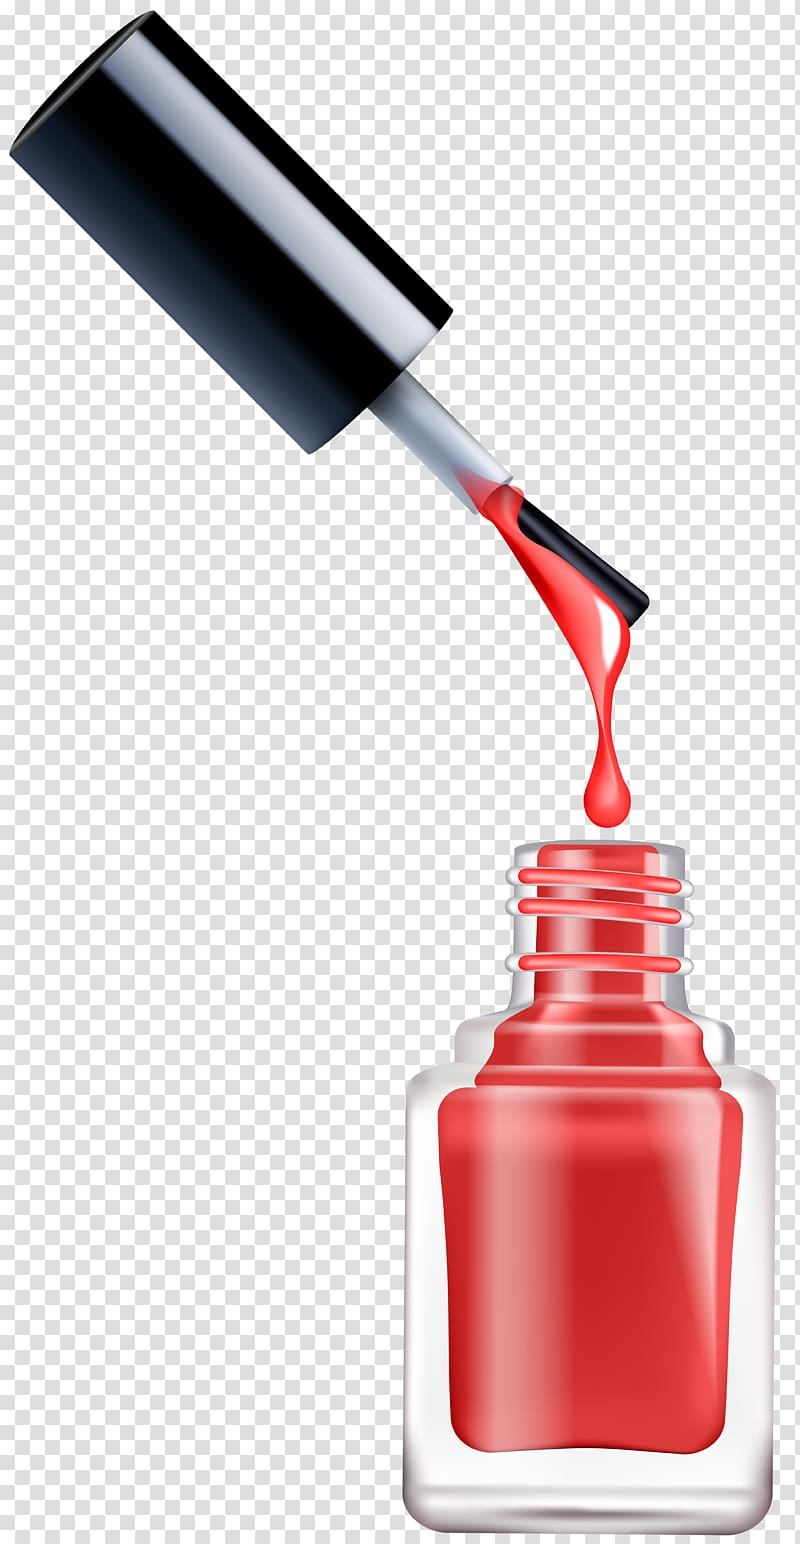 Opened pink illustration . Nail clipart nail polish bottle